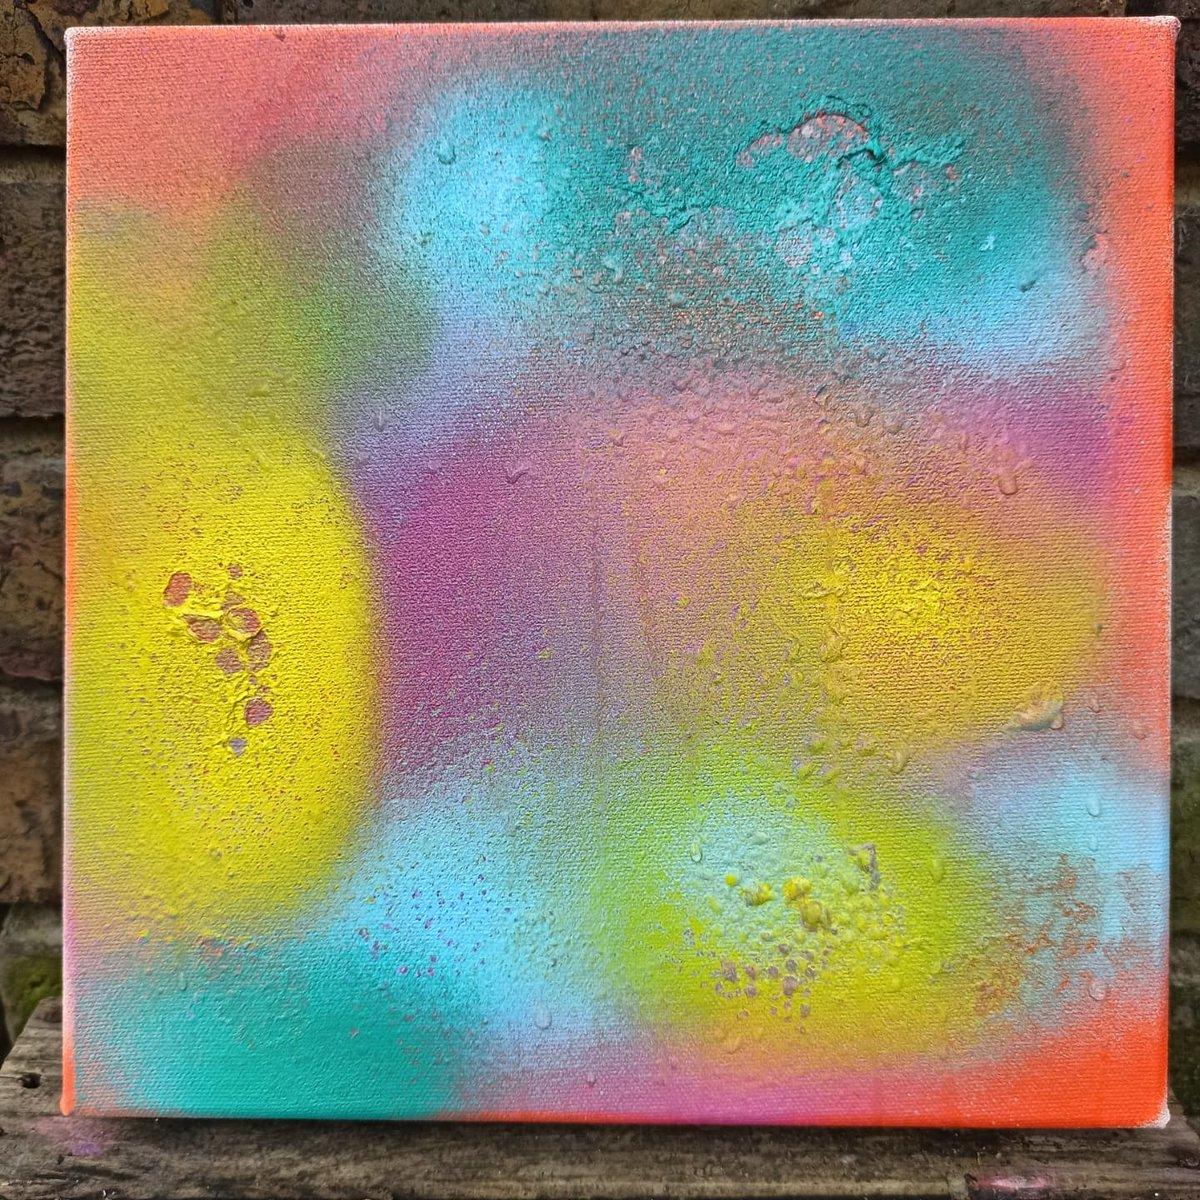 Sunrise. Mixed media on canvas. 🙏🤩🙏 #abstractart #artoftheday #abstractartists #abstractpainting #abstractartist #abstracts #brentfordtw8 #brentford #brentfordriviera #brentforddock #contemporarypainting #contemporaryart #instaart #instagood #colourpop #artforsale